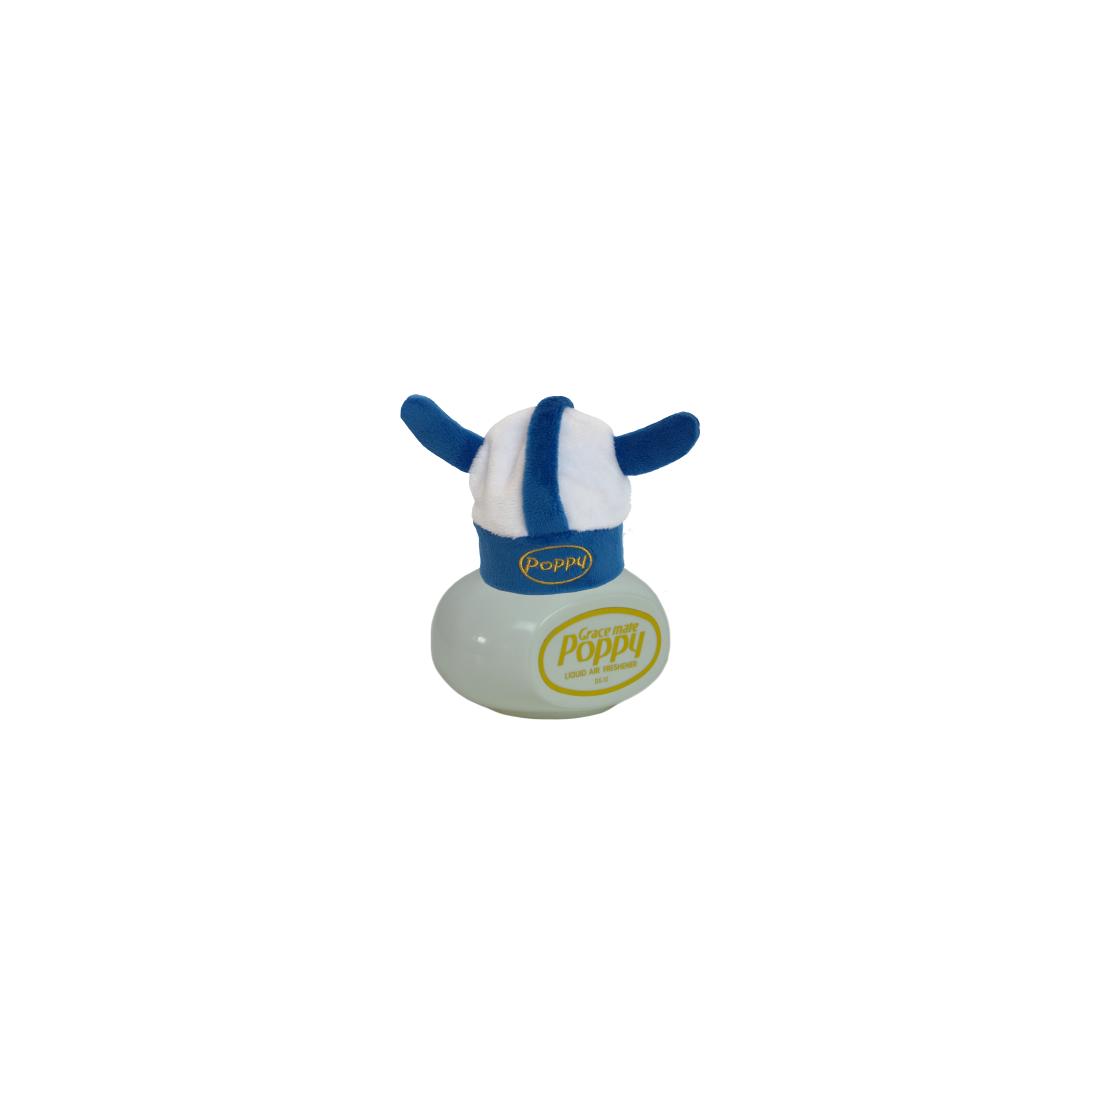 POPPY cap Finland